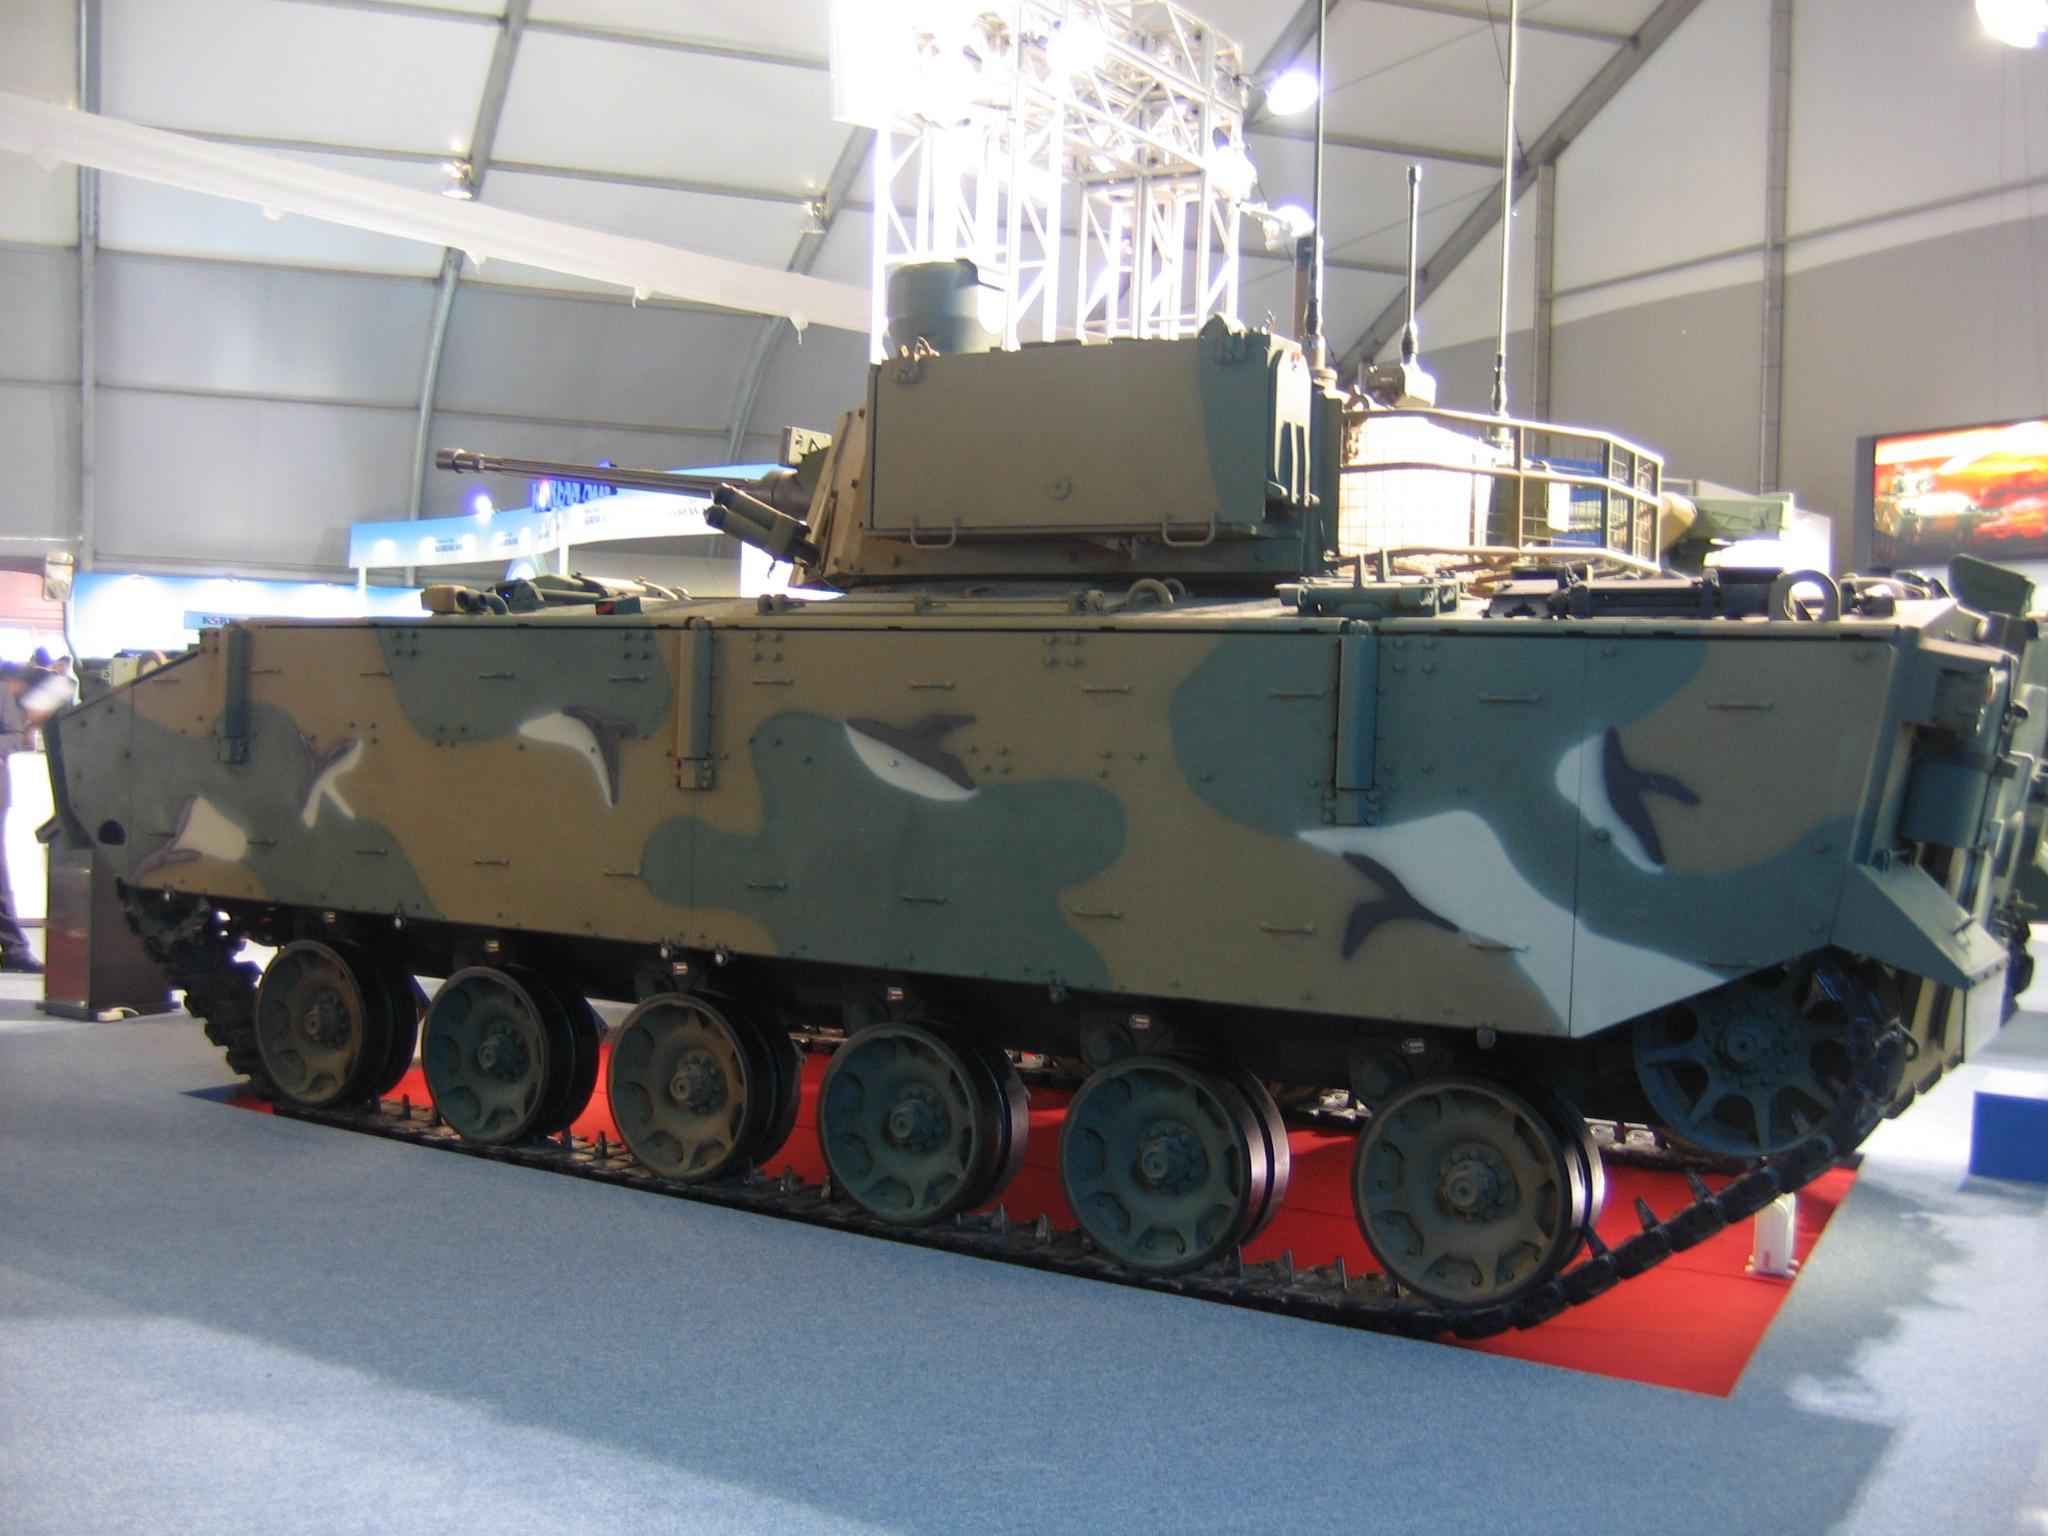 Depiction of K-21 VCI